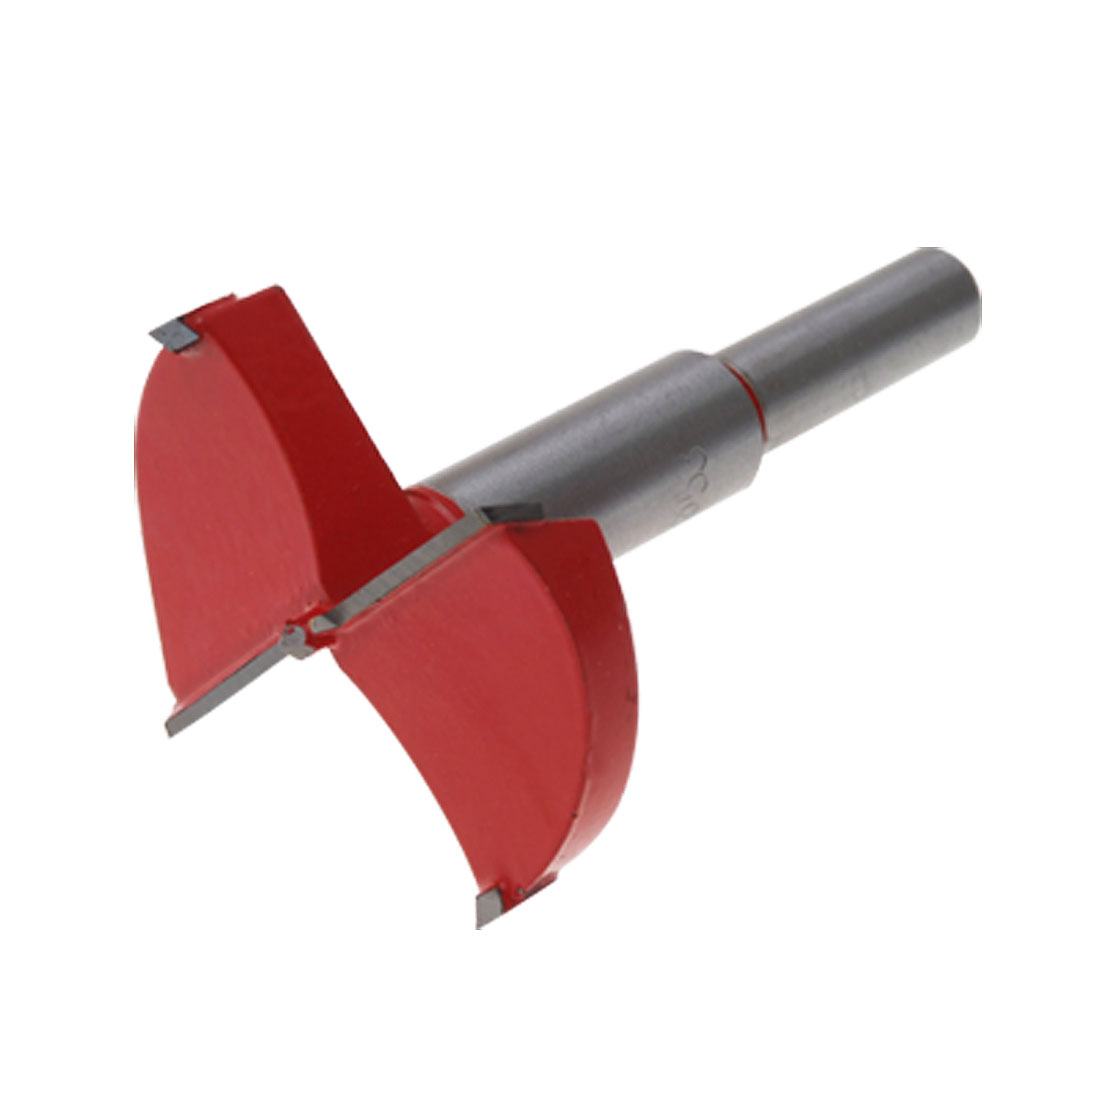 Red Metal 53MM Woodworking Forstner Bit Wood Boring Tool